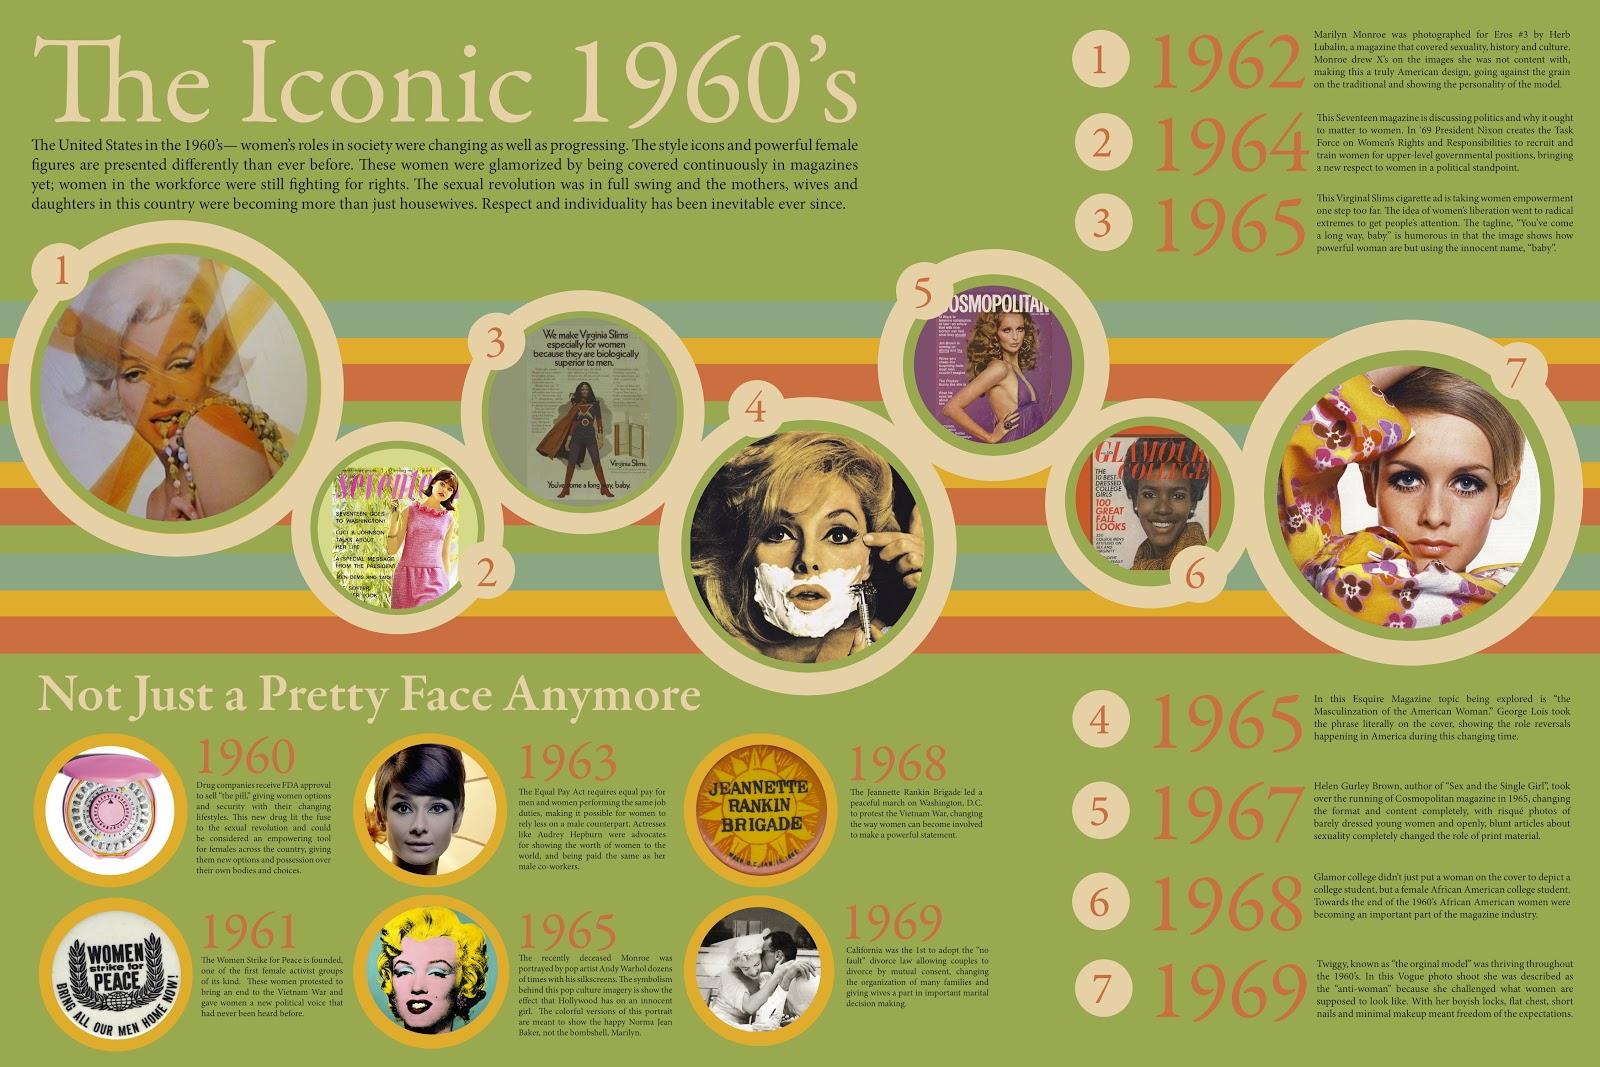 The Iconic 1960's Timeline | danyelle bergen design